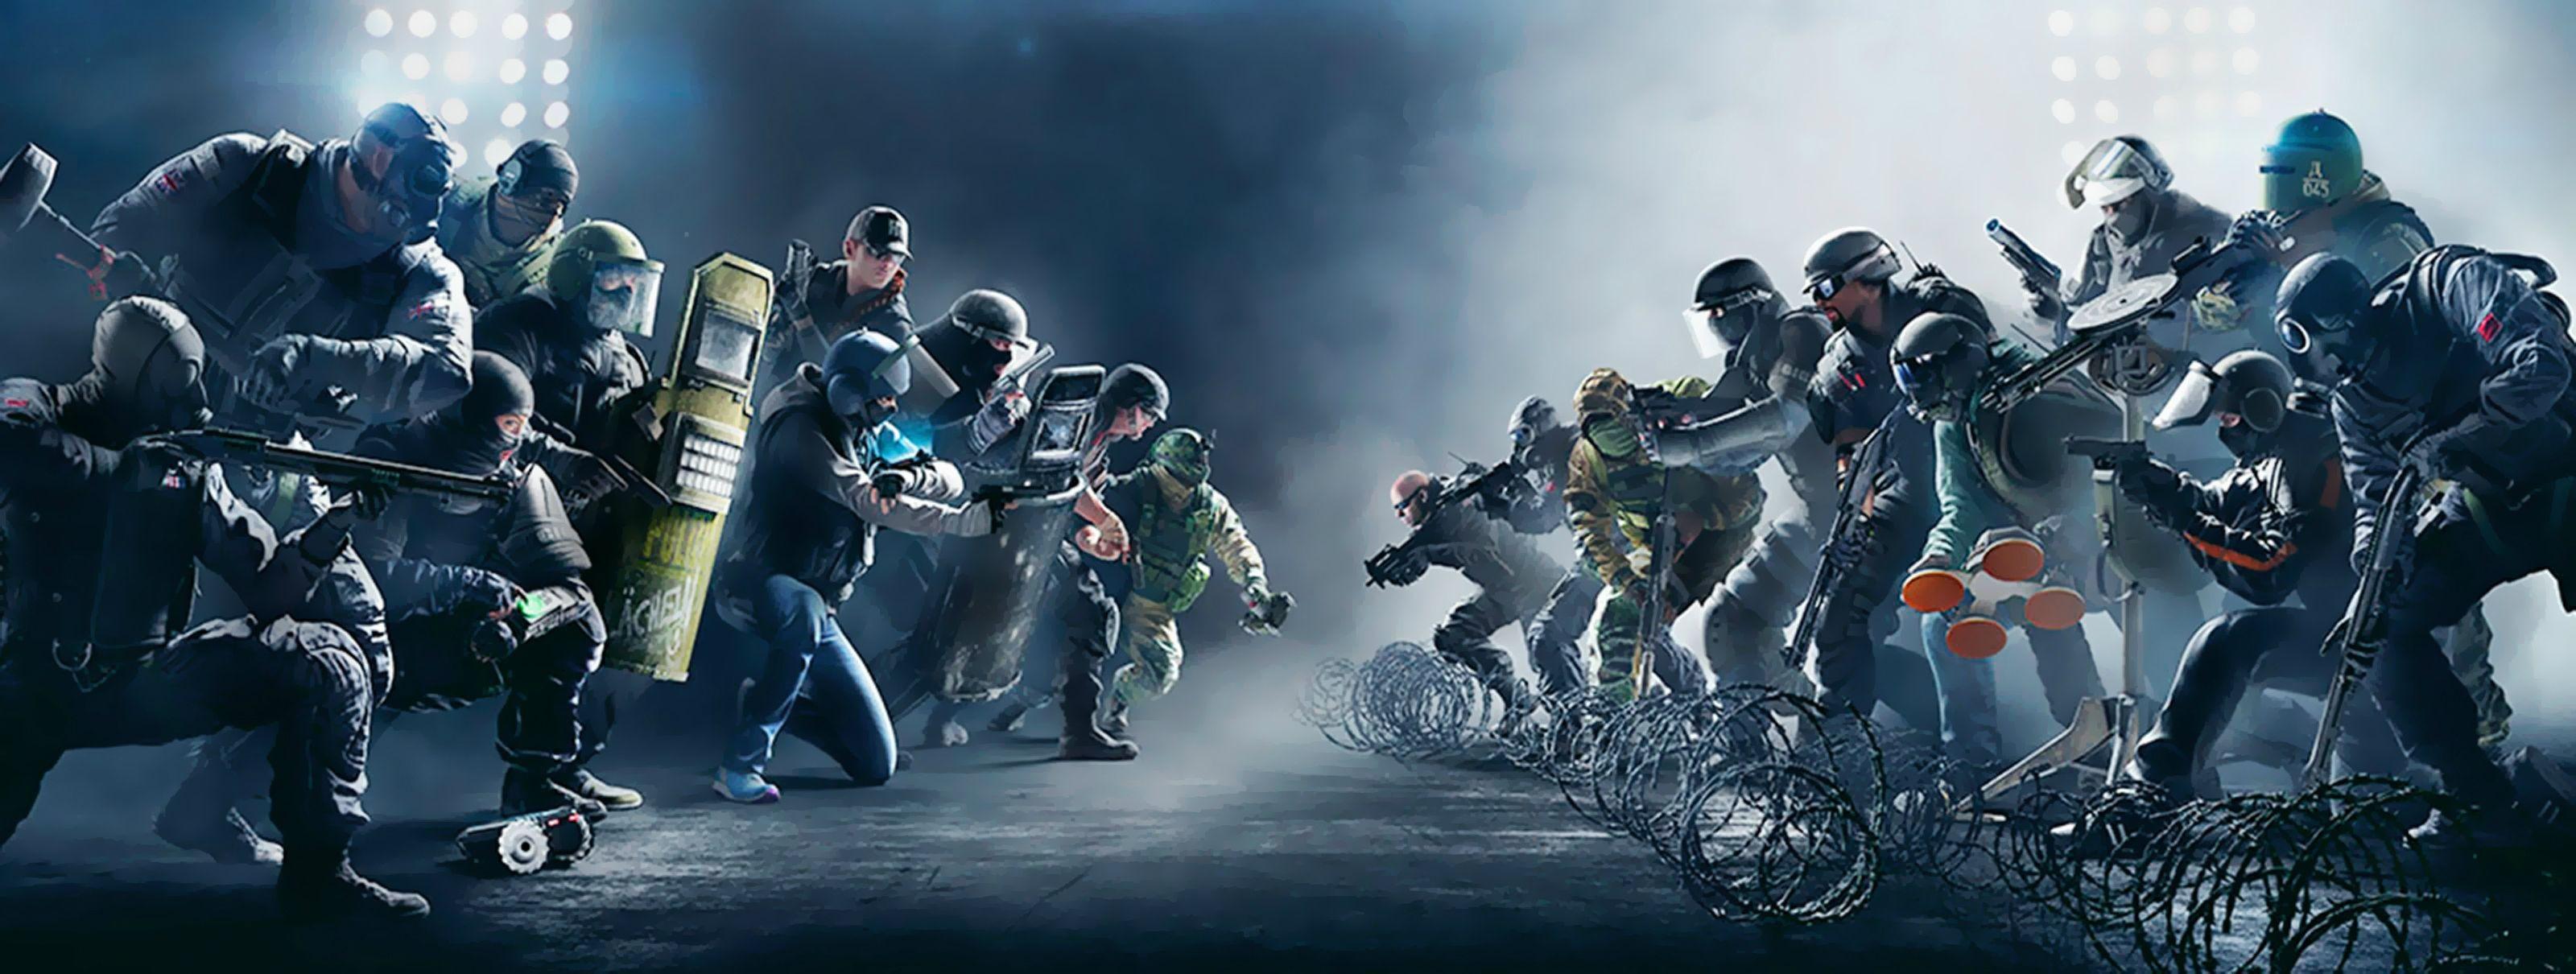 Rainbow Six Siege Wallpapers: Rainbow Six Siege Background ·① Download Free HD